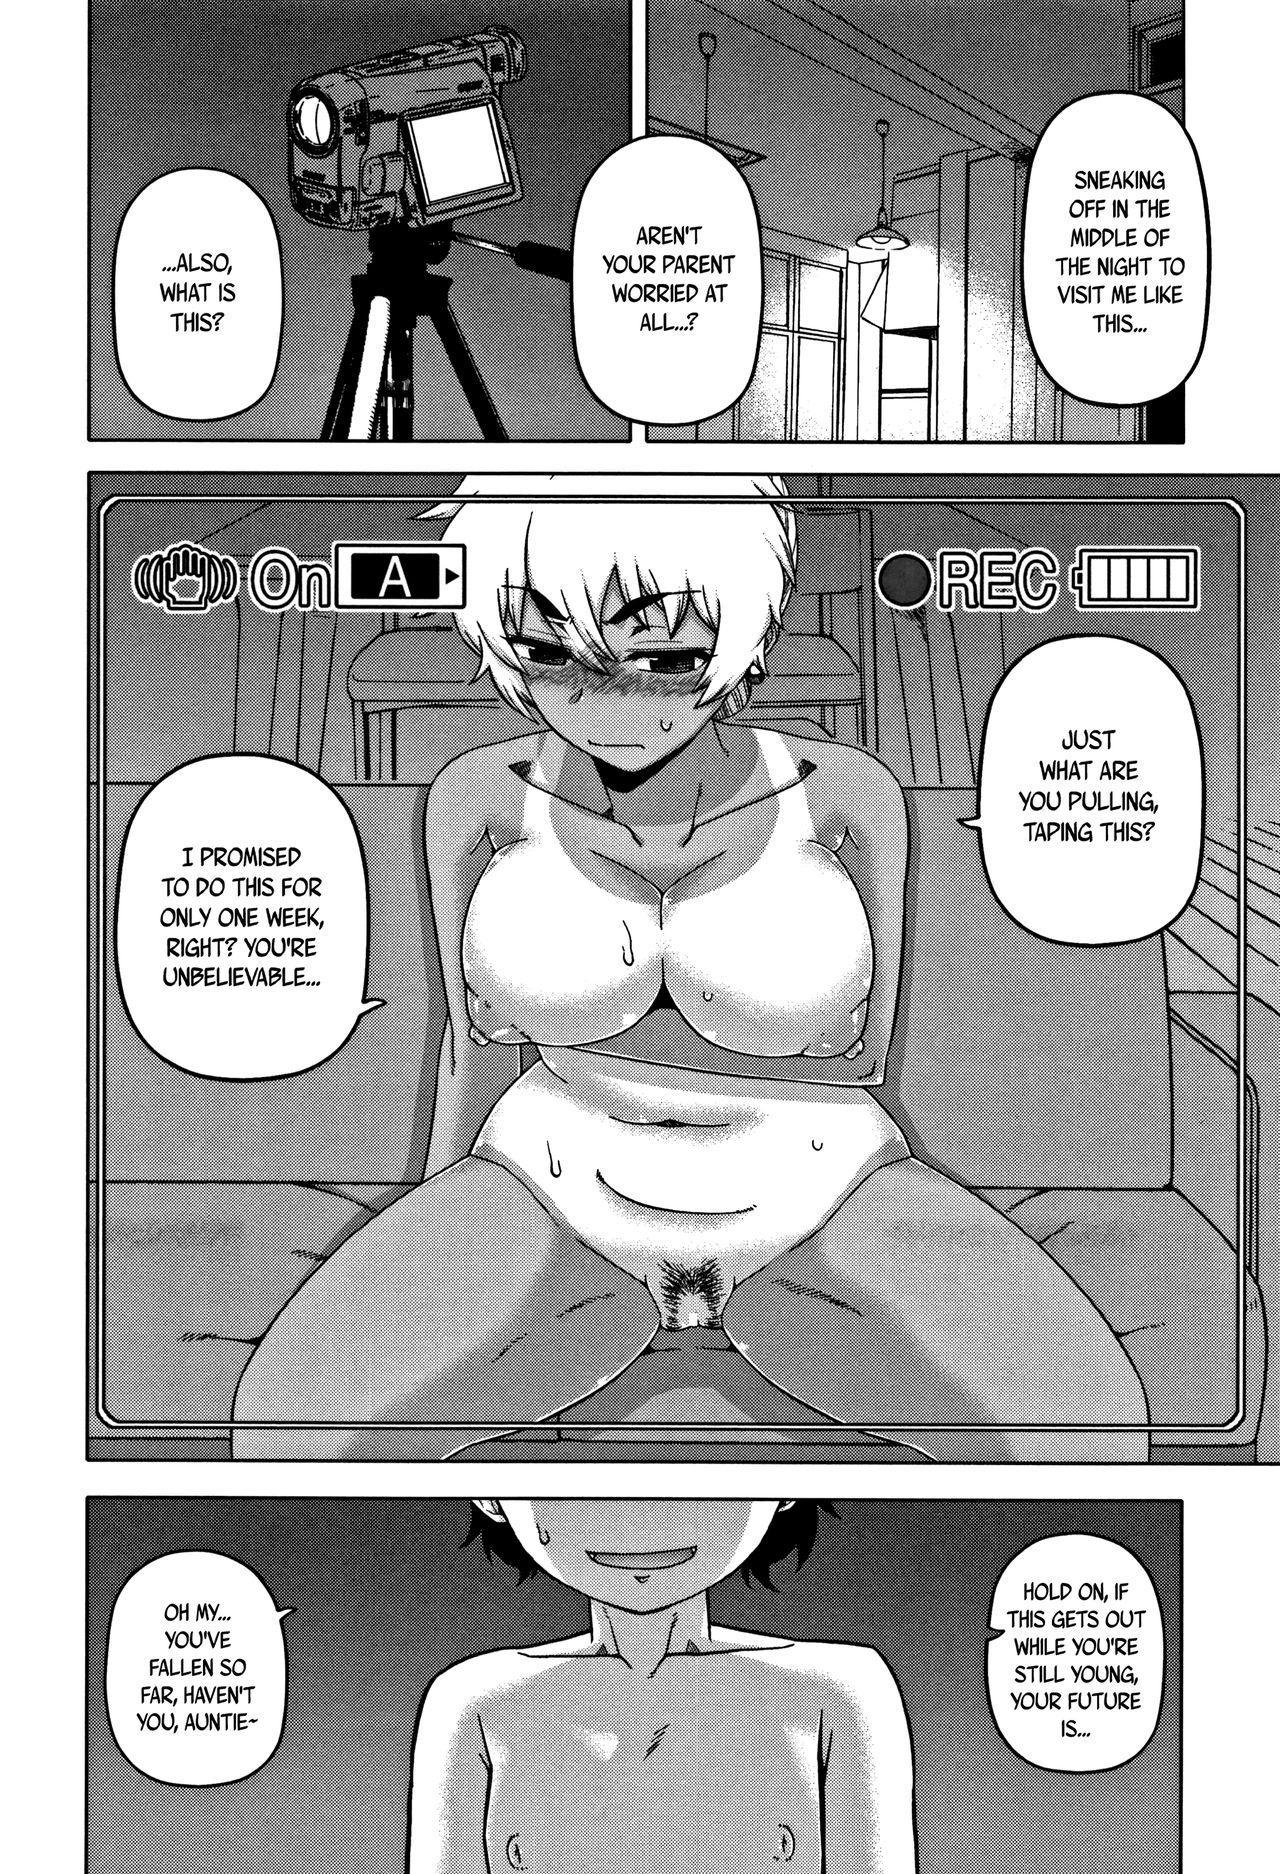 [Takatsu] Hitozuma A-san to Musuko no Yuujin N-kun - Married wife A and son's friend N-kun Ch. 1-3 [English] 29